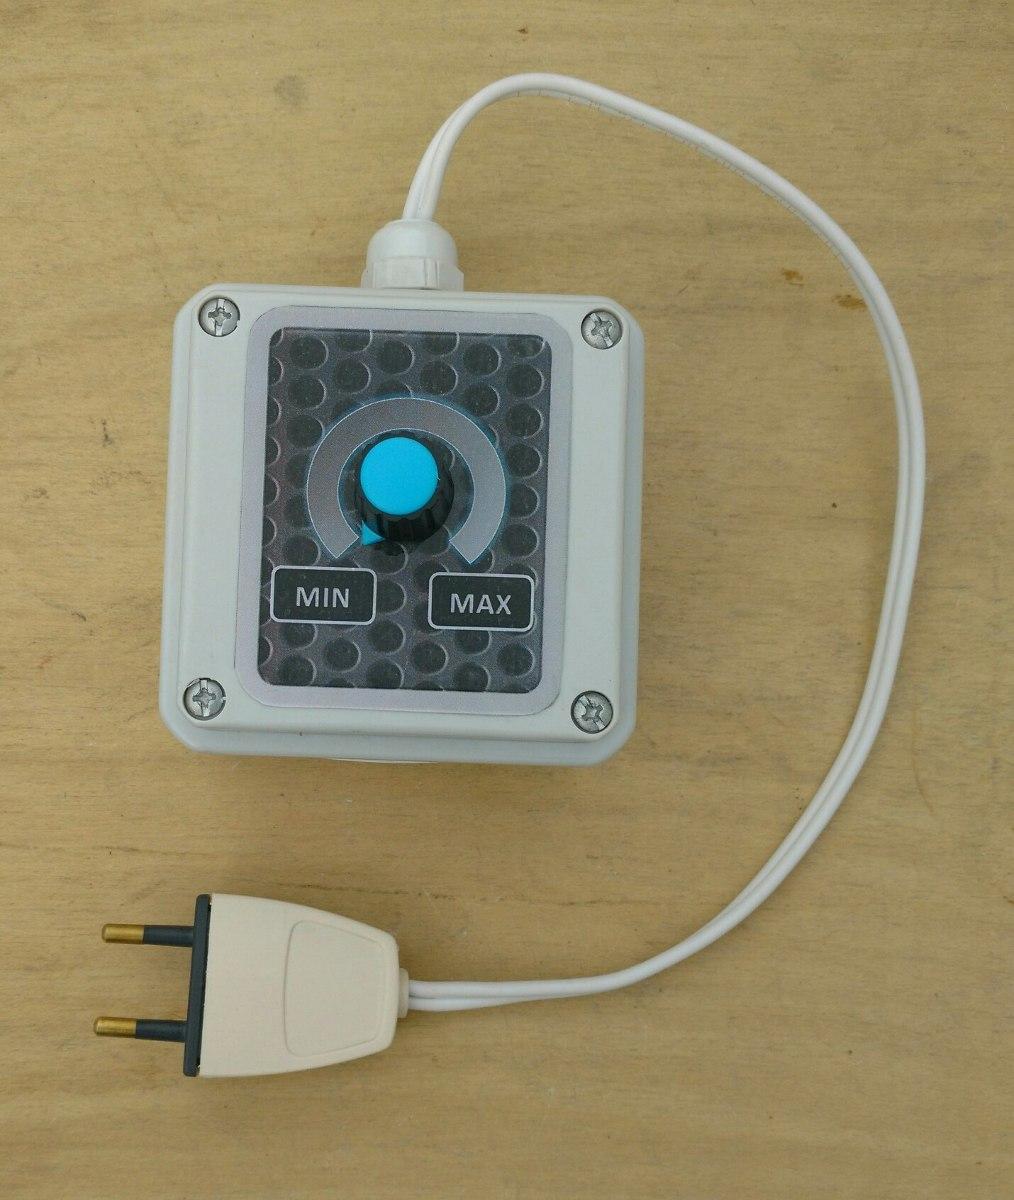 Atenuador Dimmer Regulador De Potencia Enchufable De 1200w 520